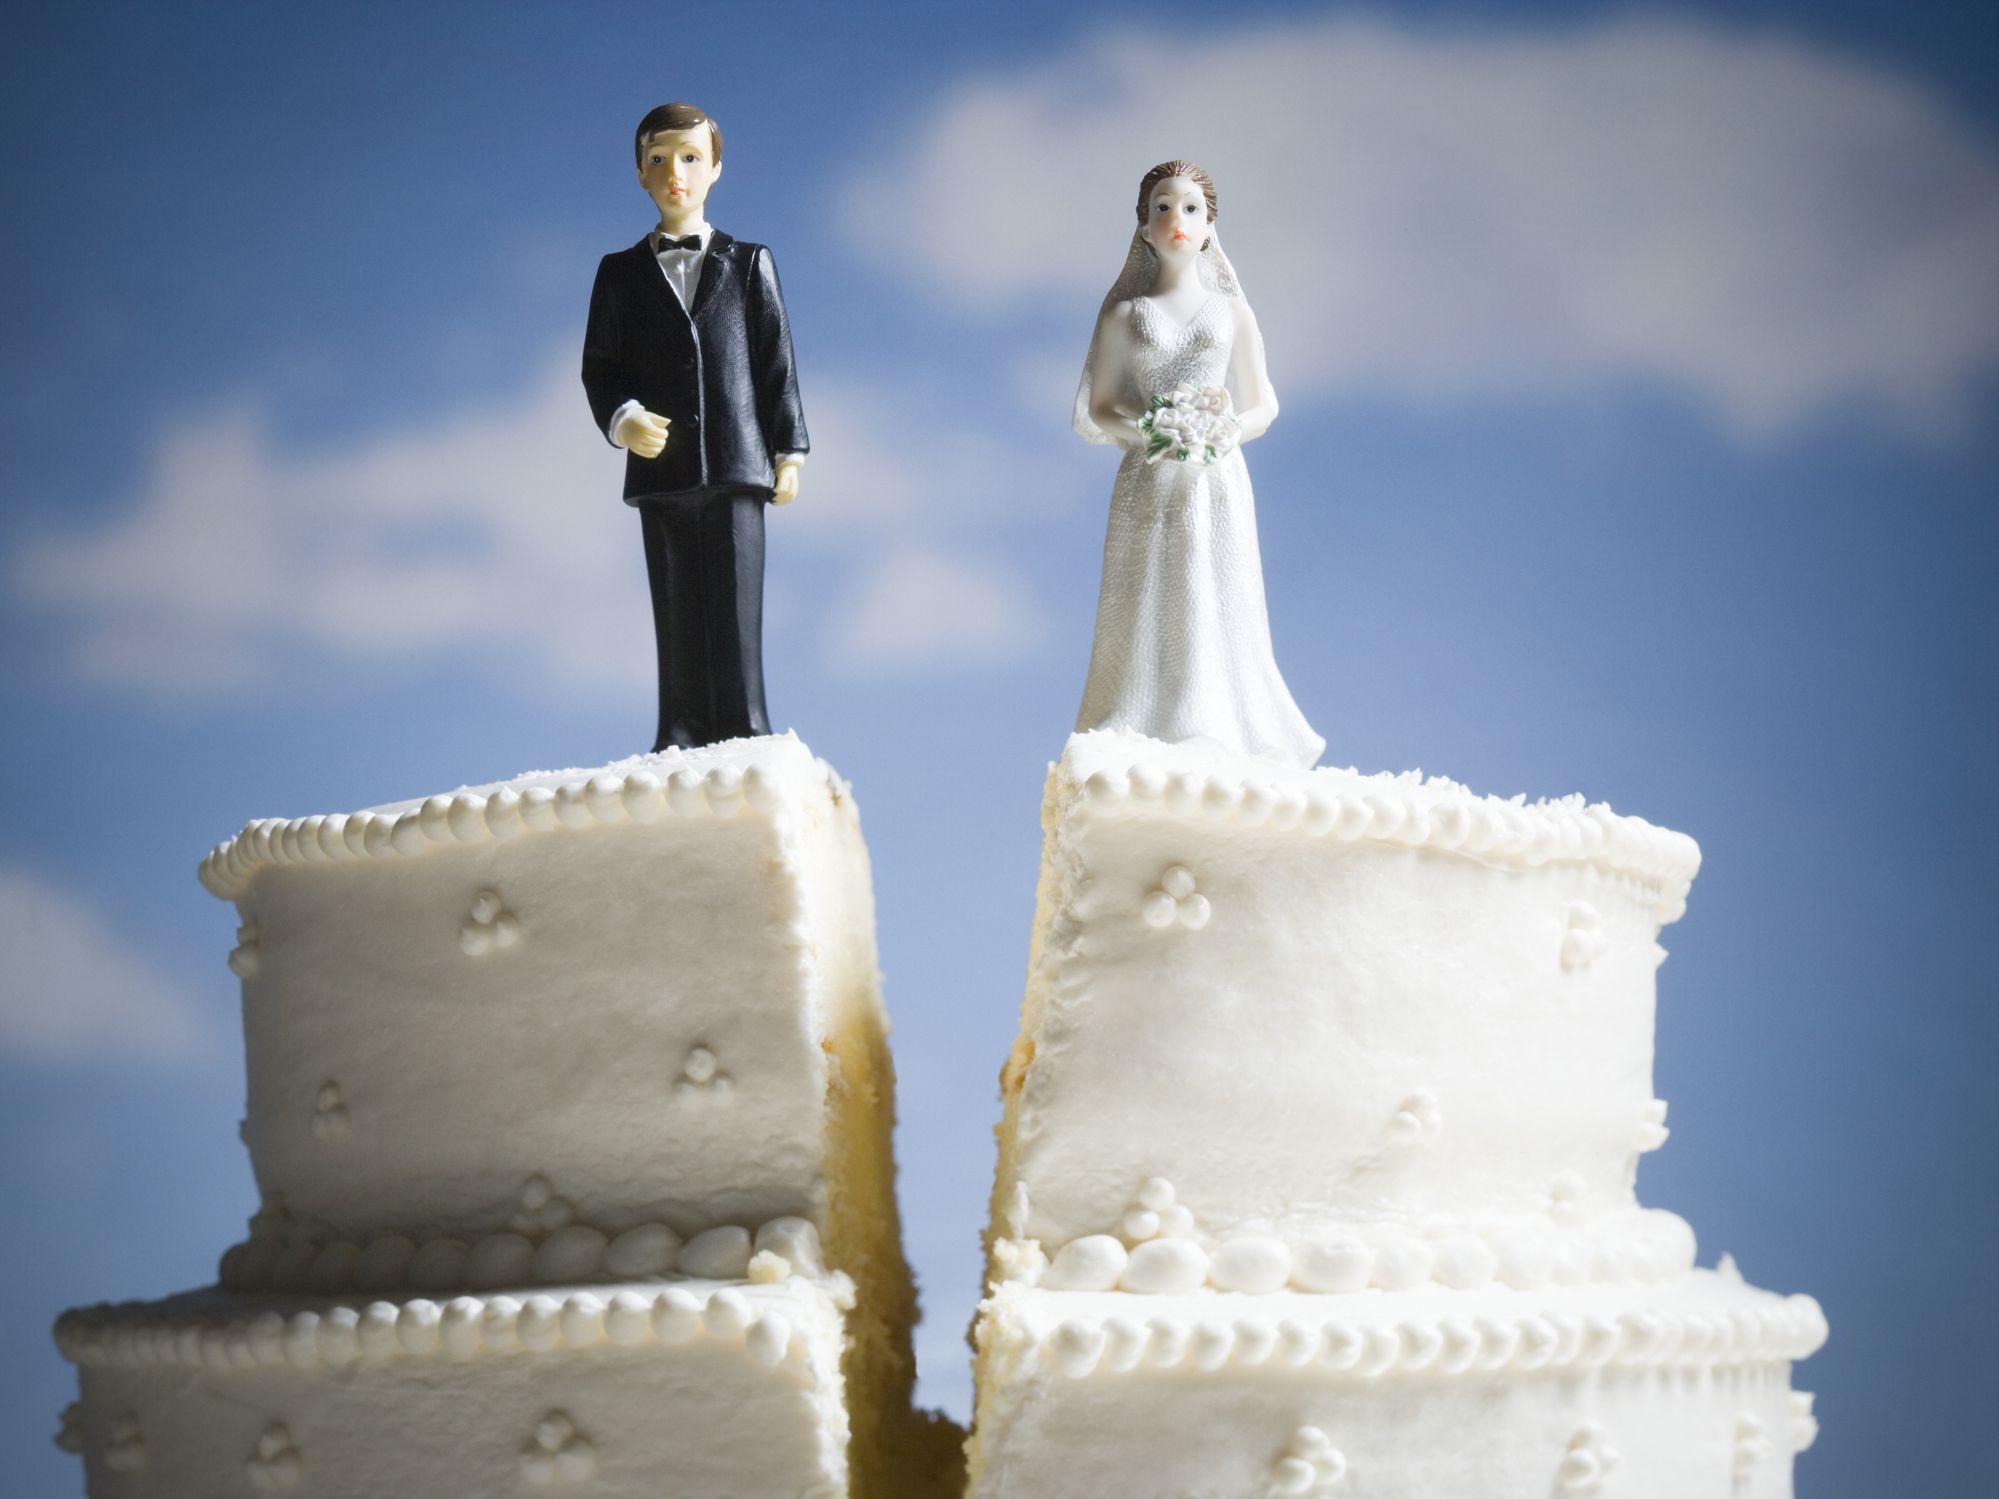 My husband terminally ill married him anyway